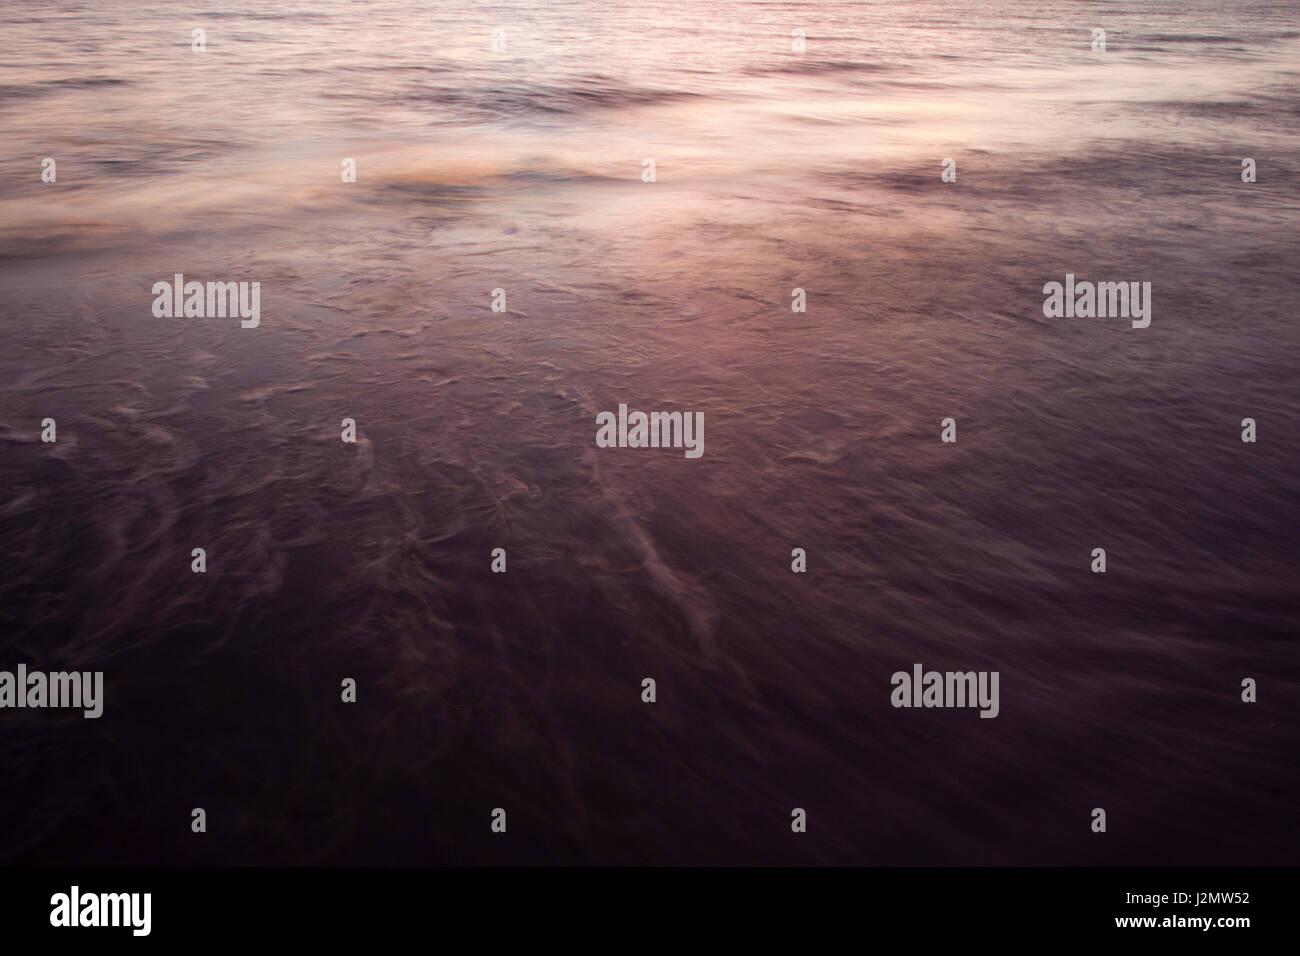 Sunset Reflected on Siesta Key Beach Surf in Sarasota, Florida. - Stock Image